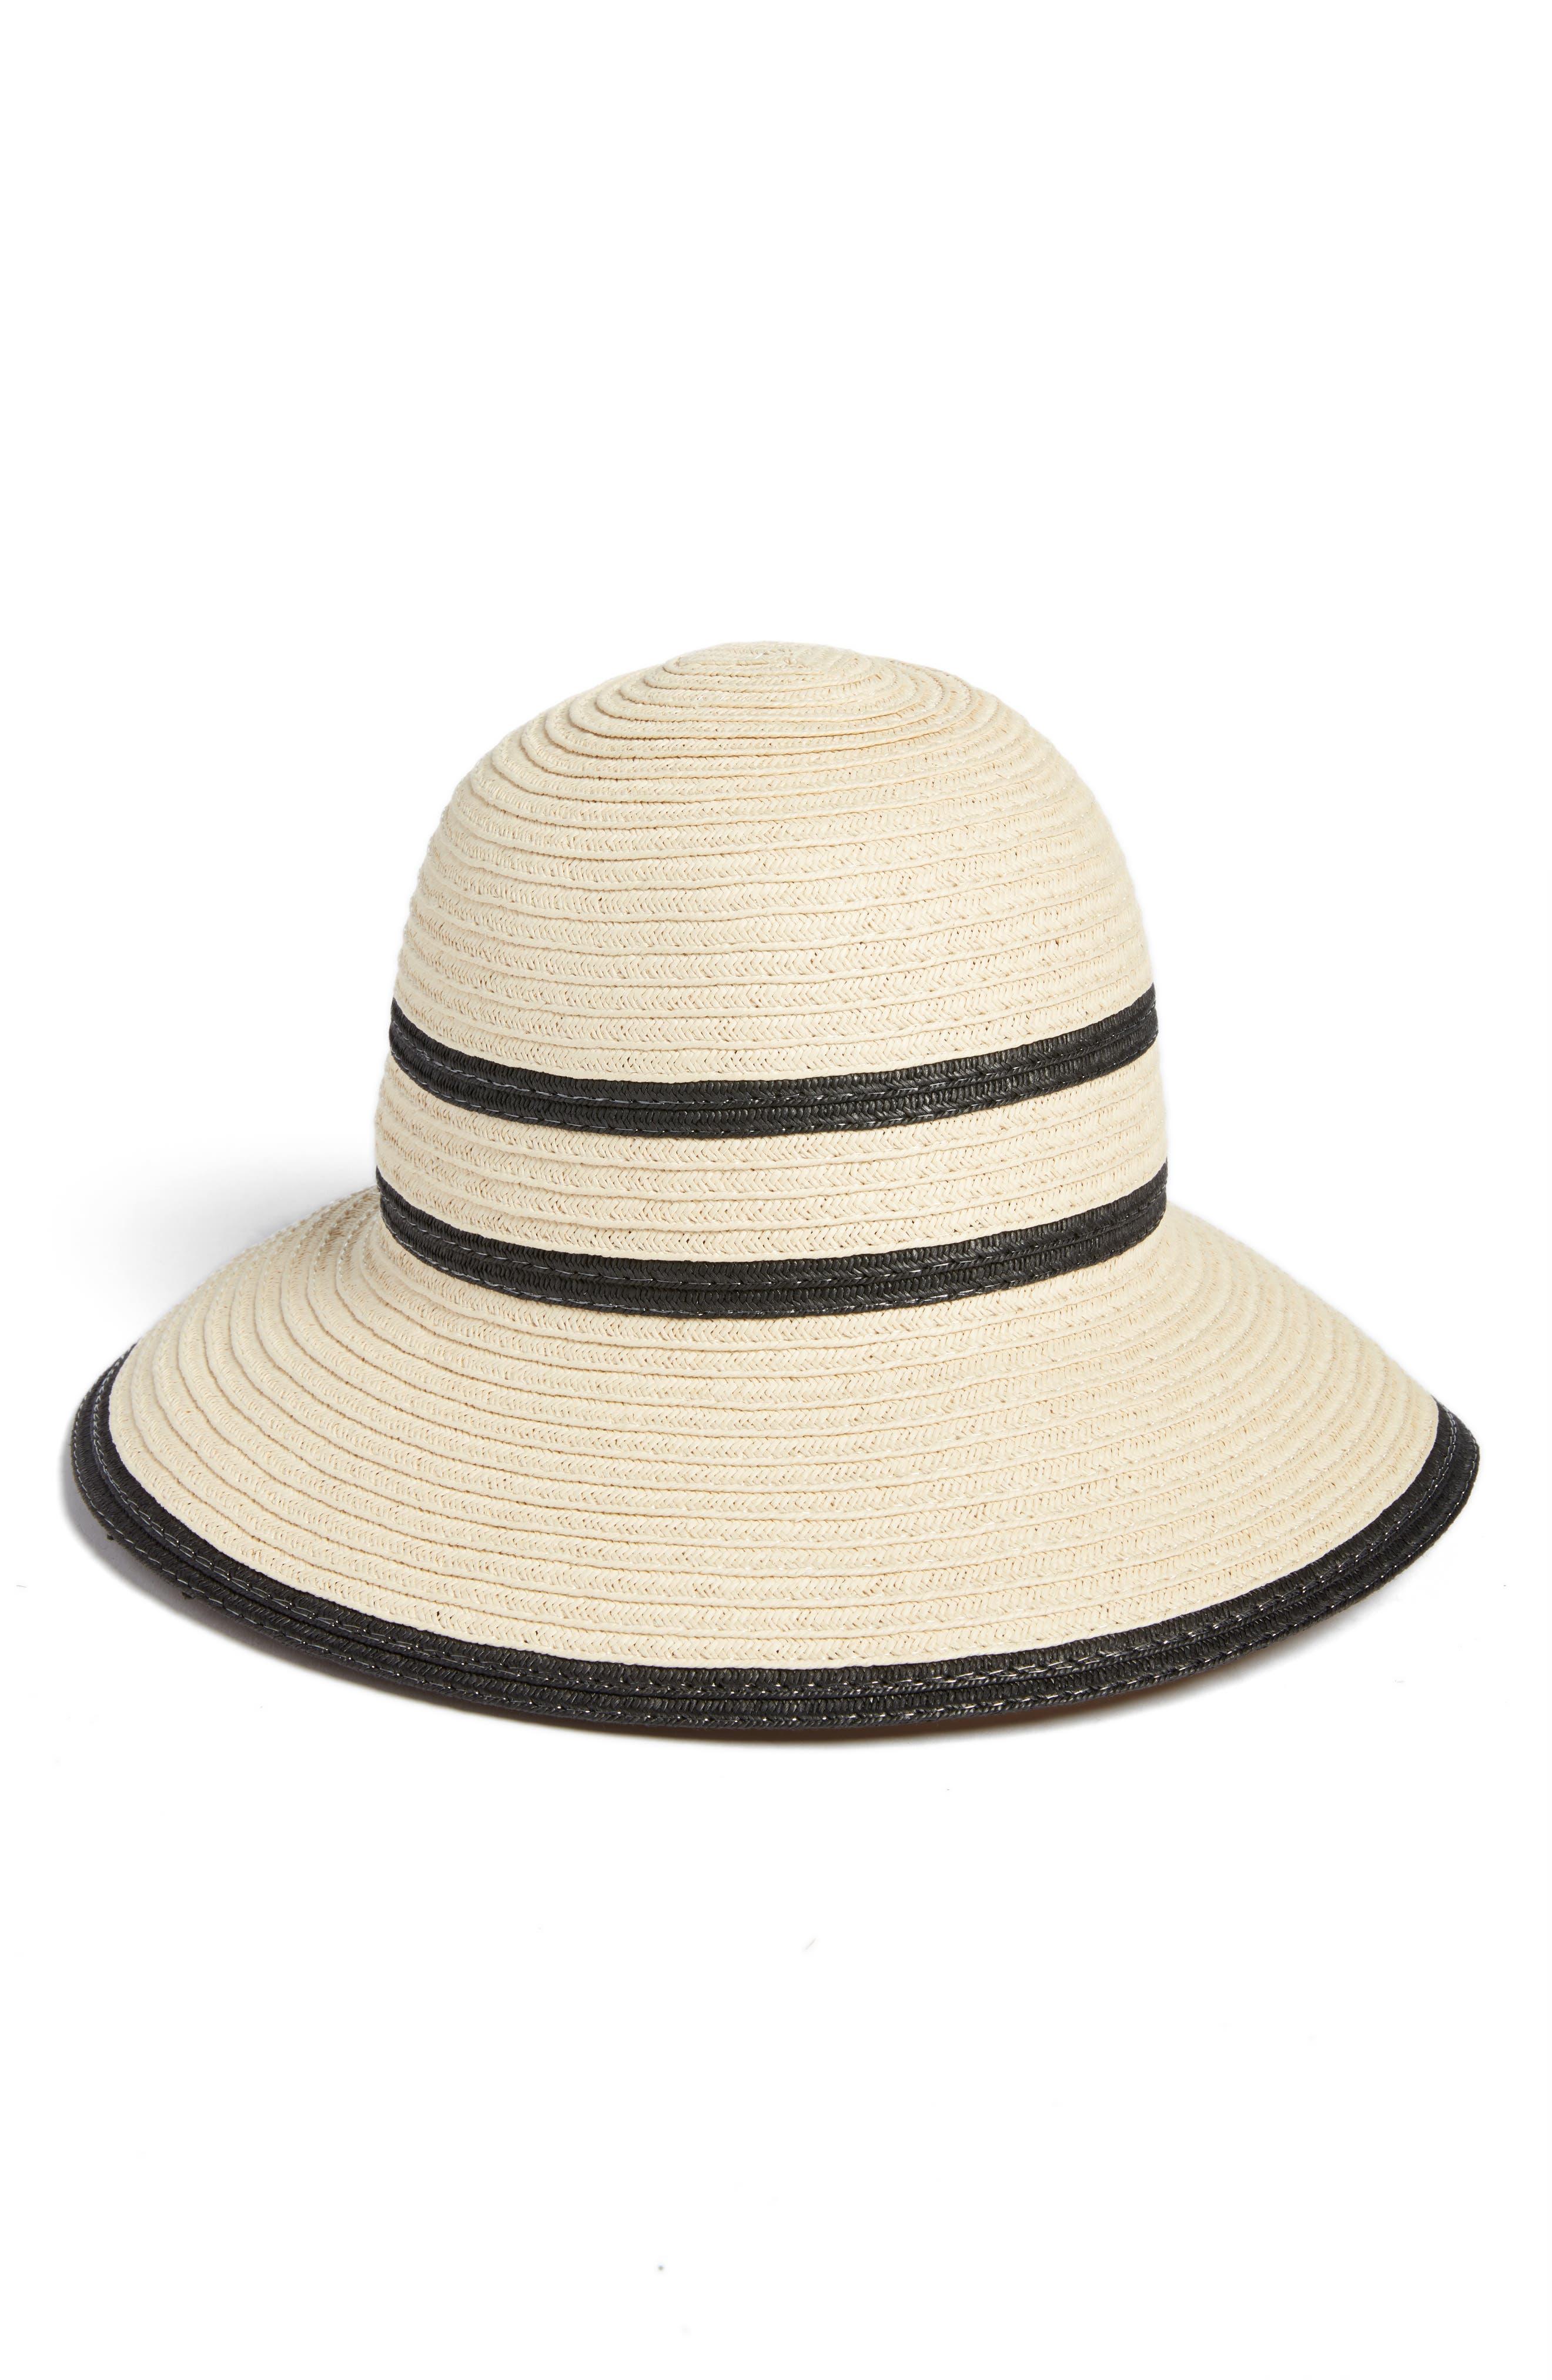 Bondi Straw Cloche Hat,                             Main thumbnail 1, color,                             Stone